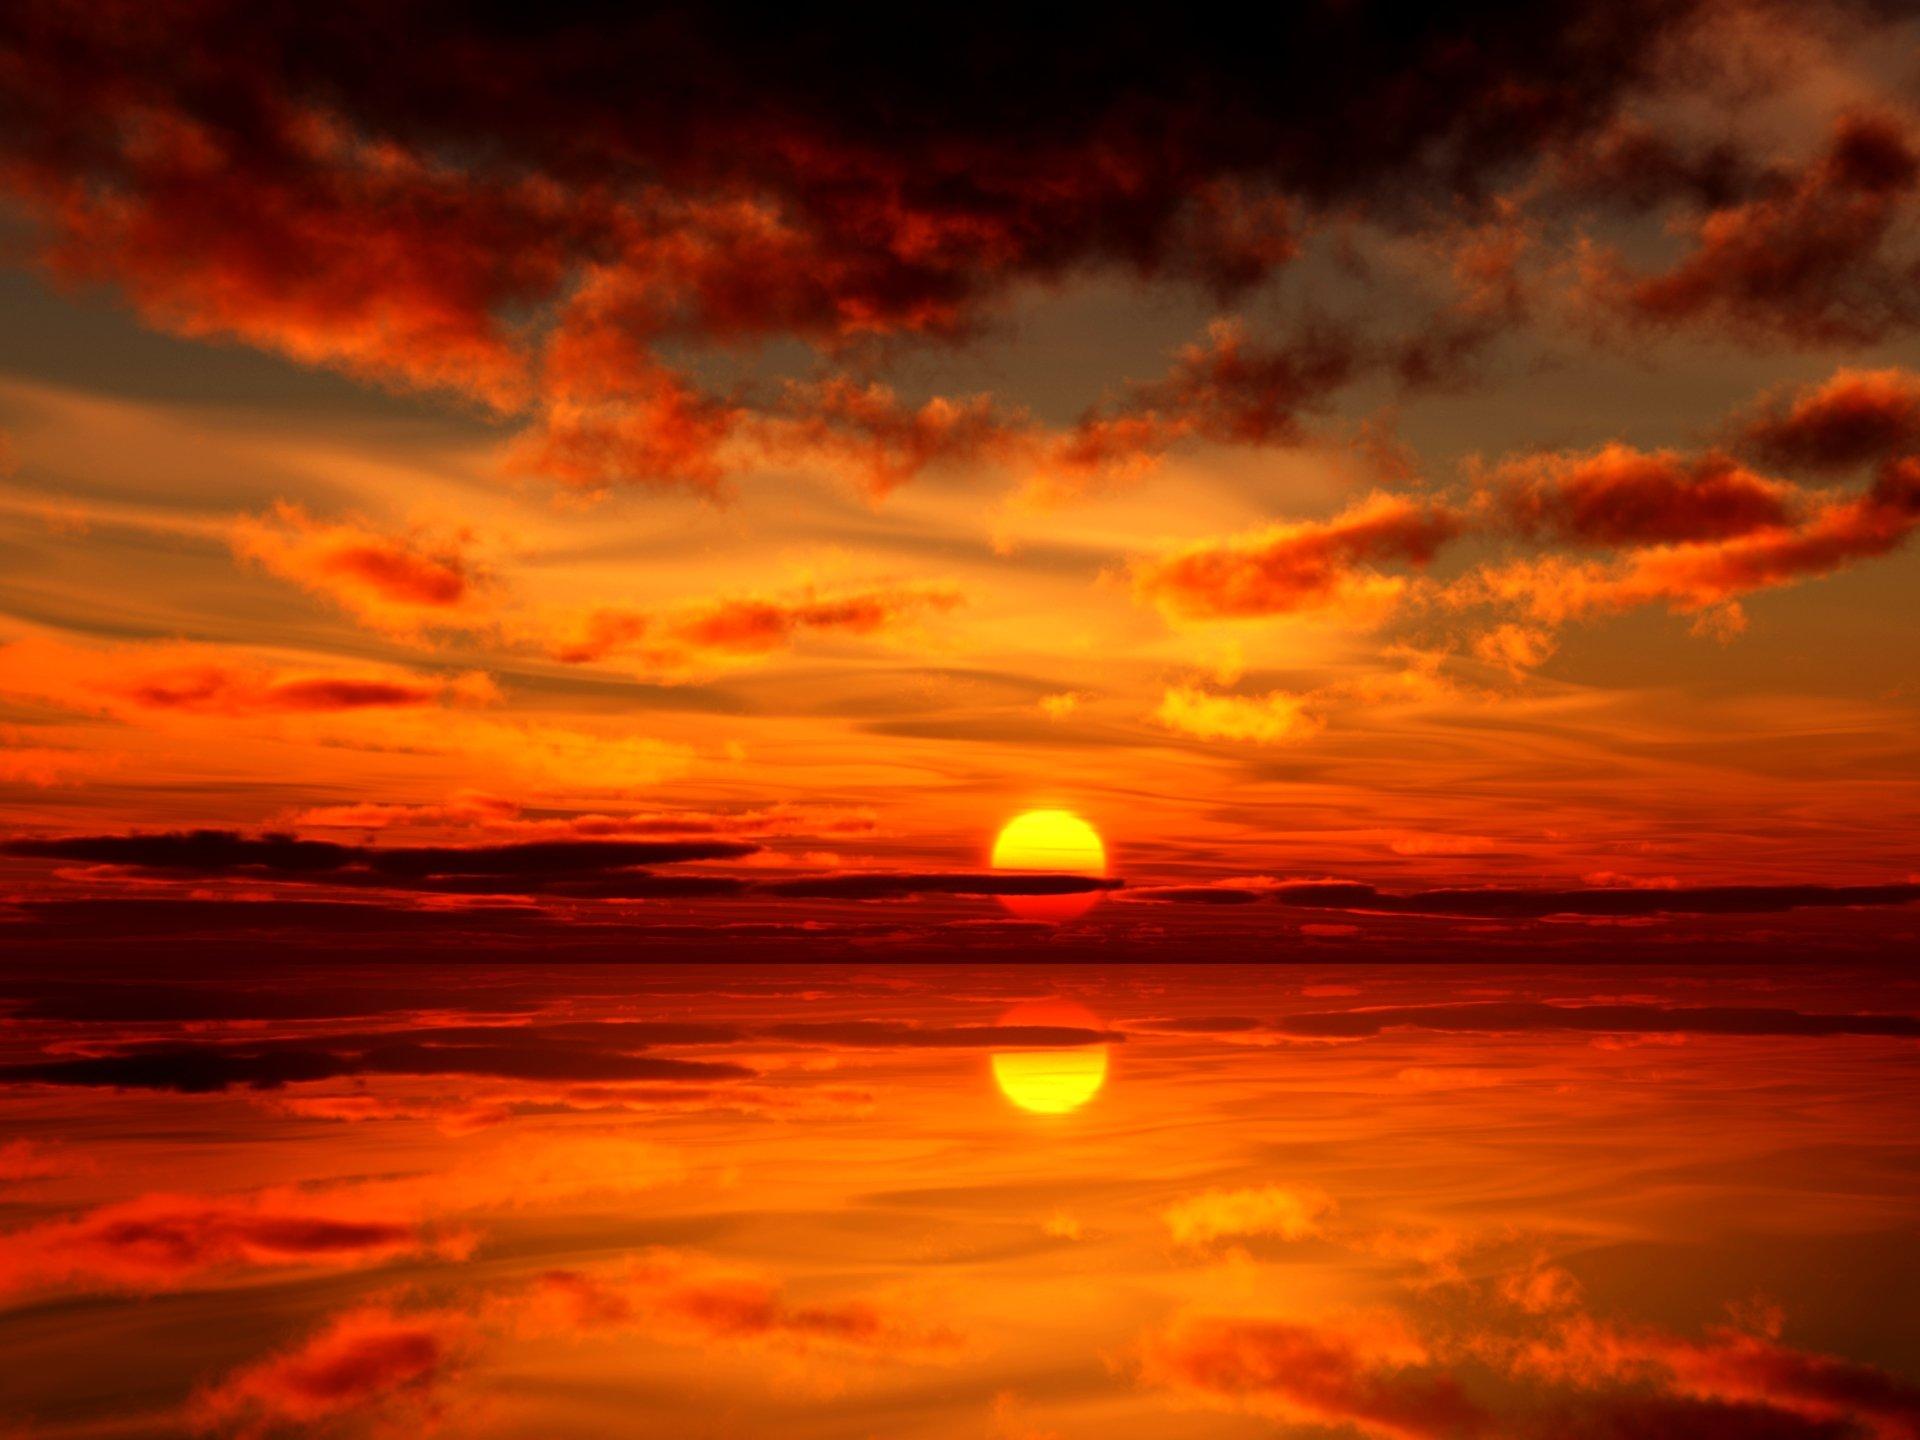 Earth - Sunset  Earth Sun Reflection Water Orange Cloud Wallpaper